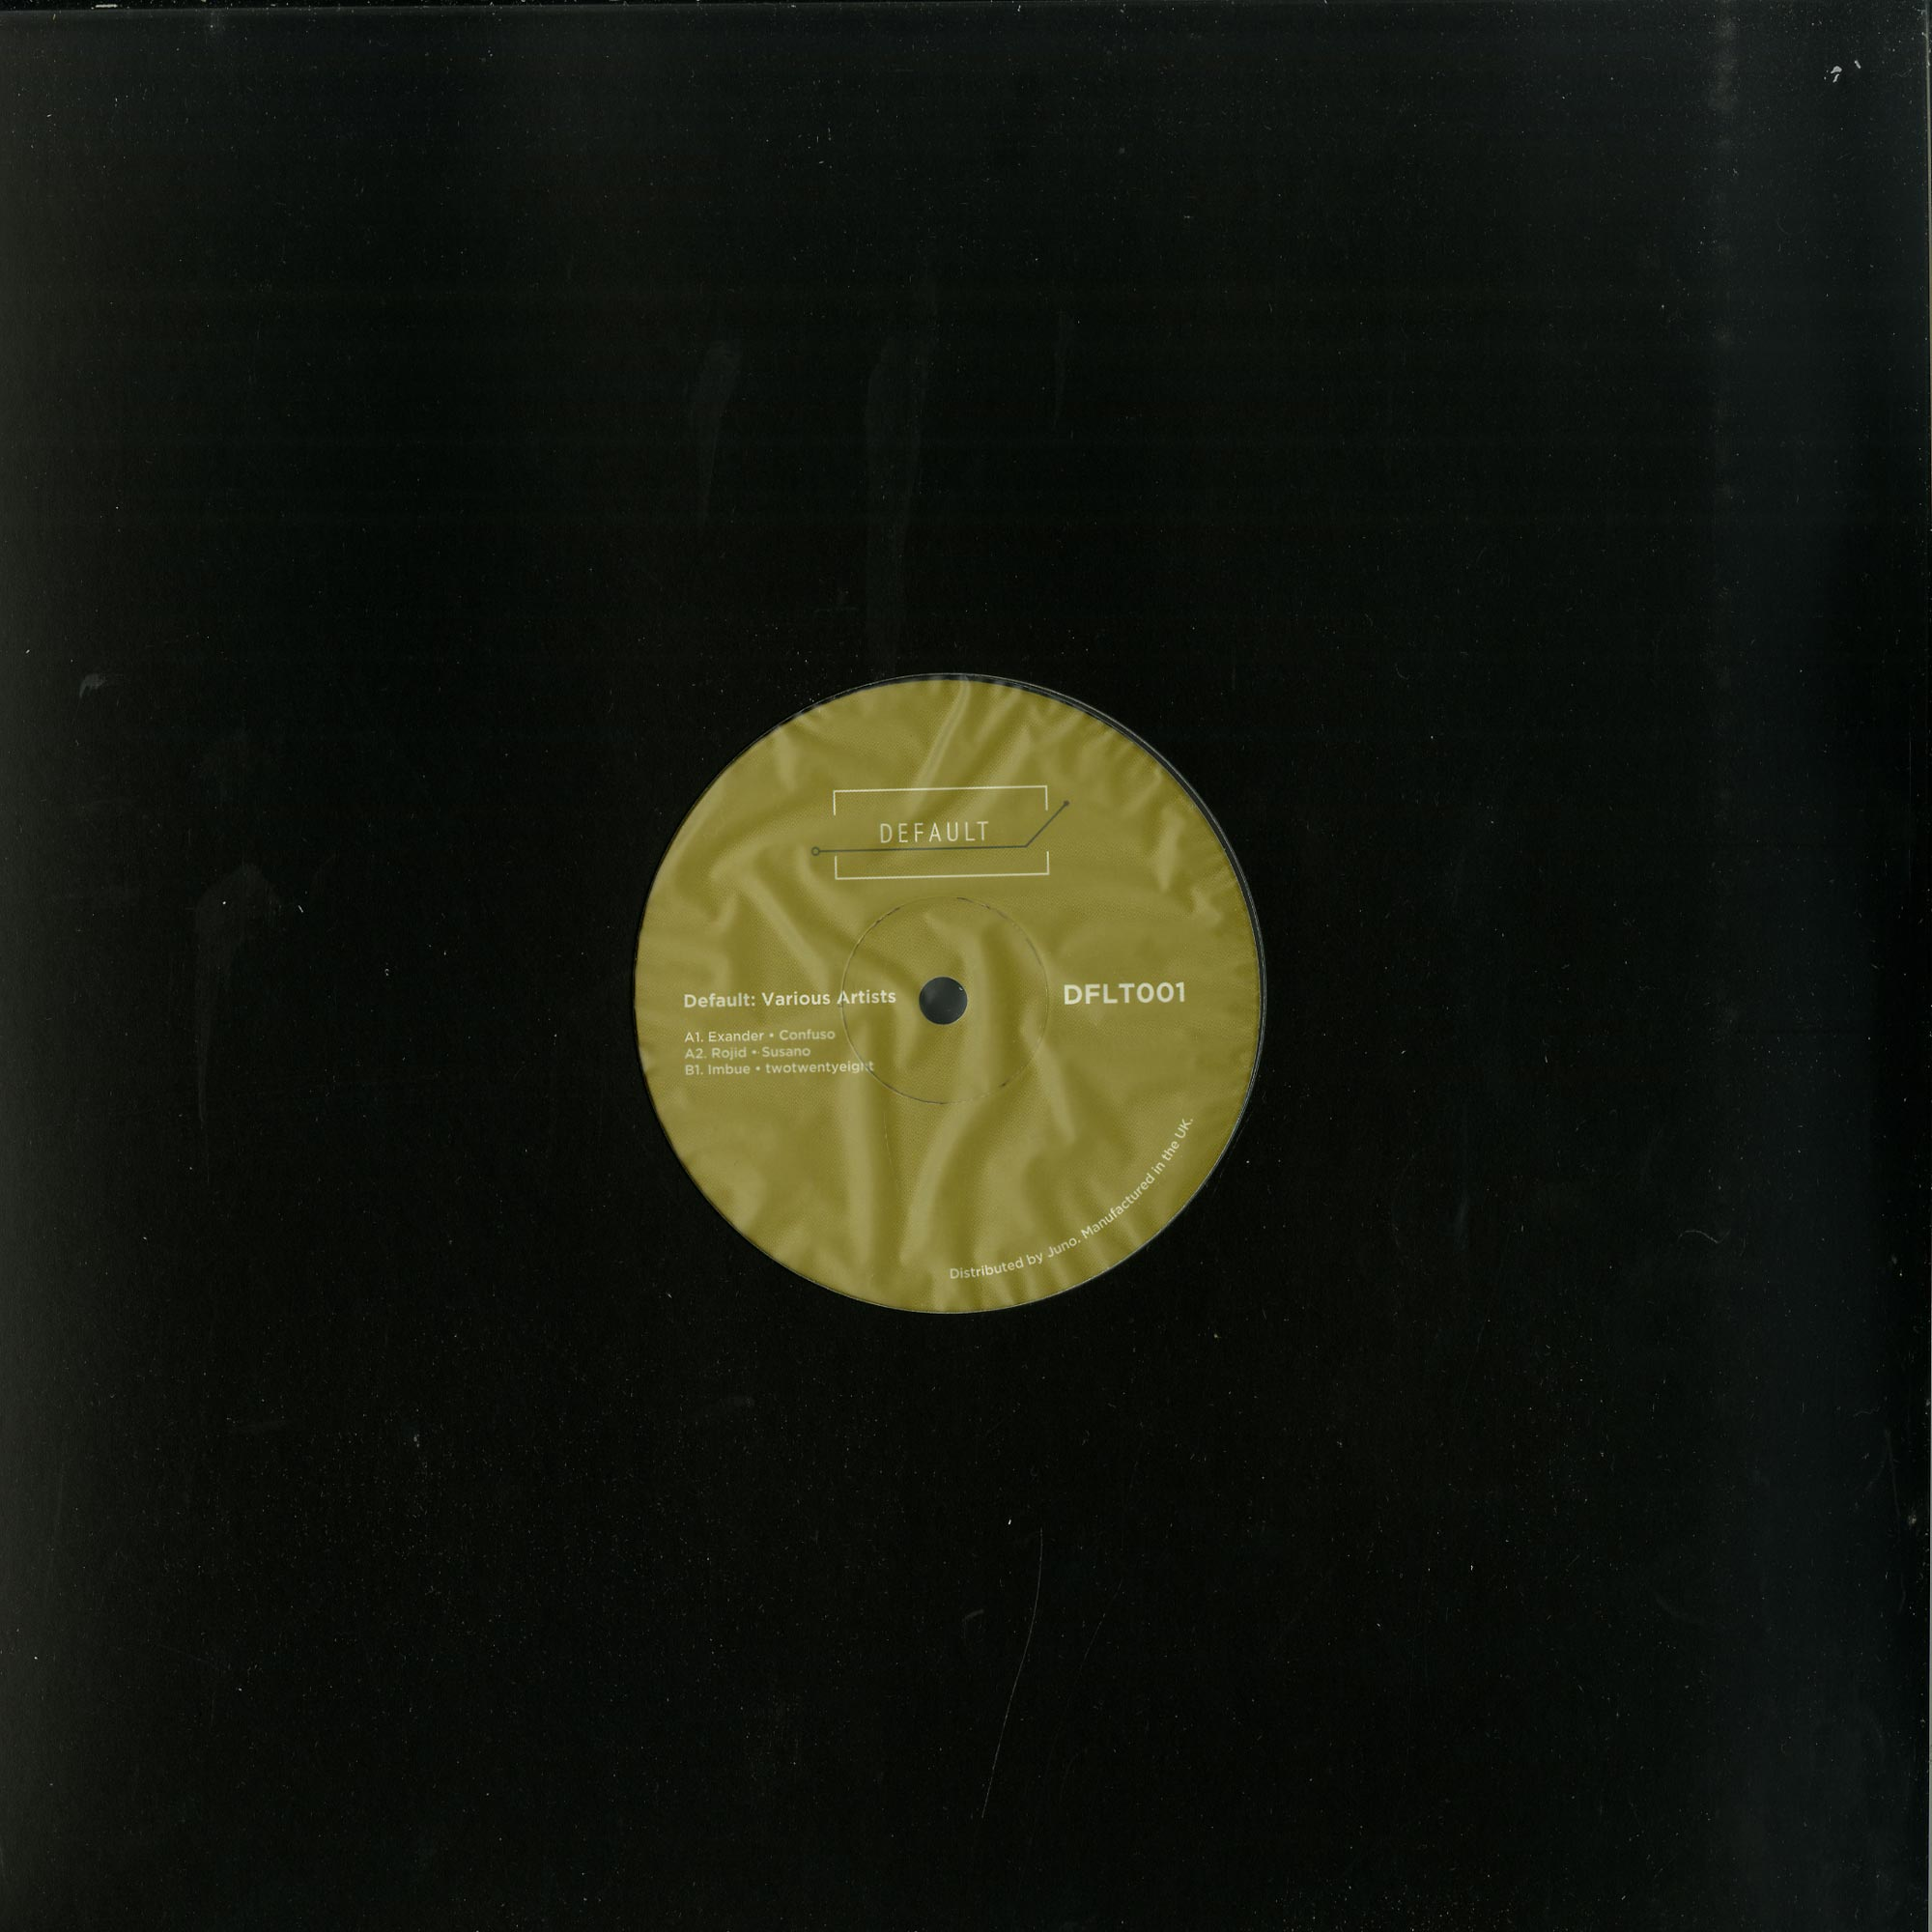 Exander / Rojid / Imbue - Default: Various Artists